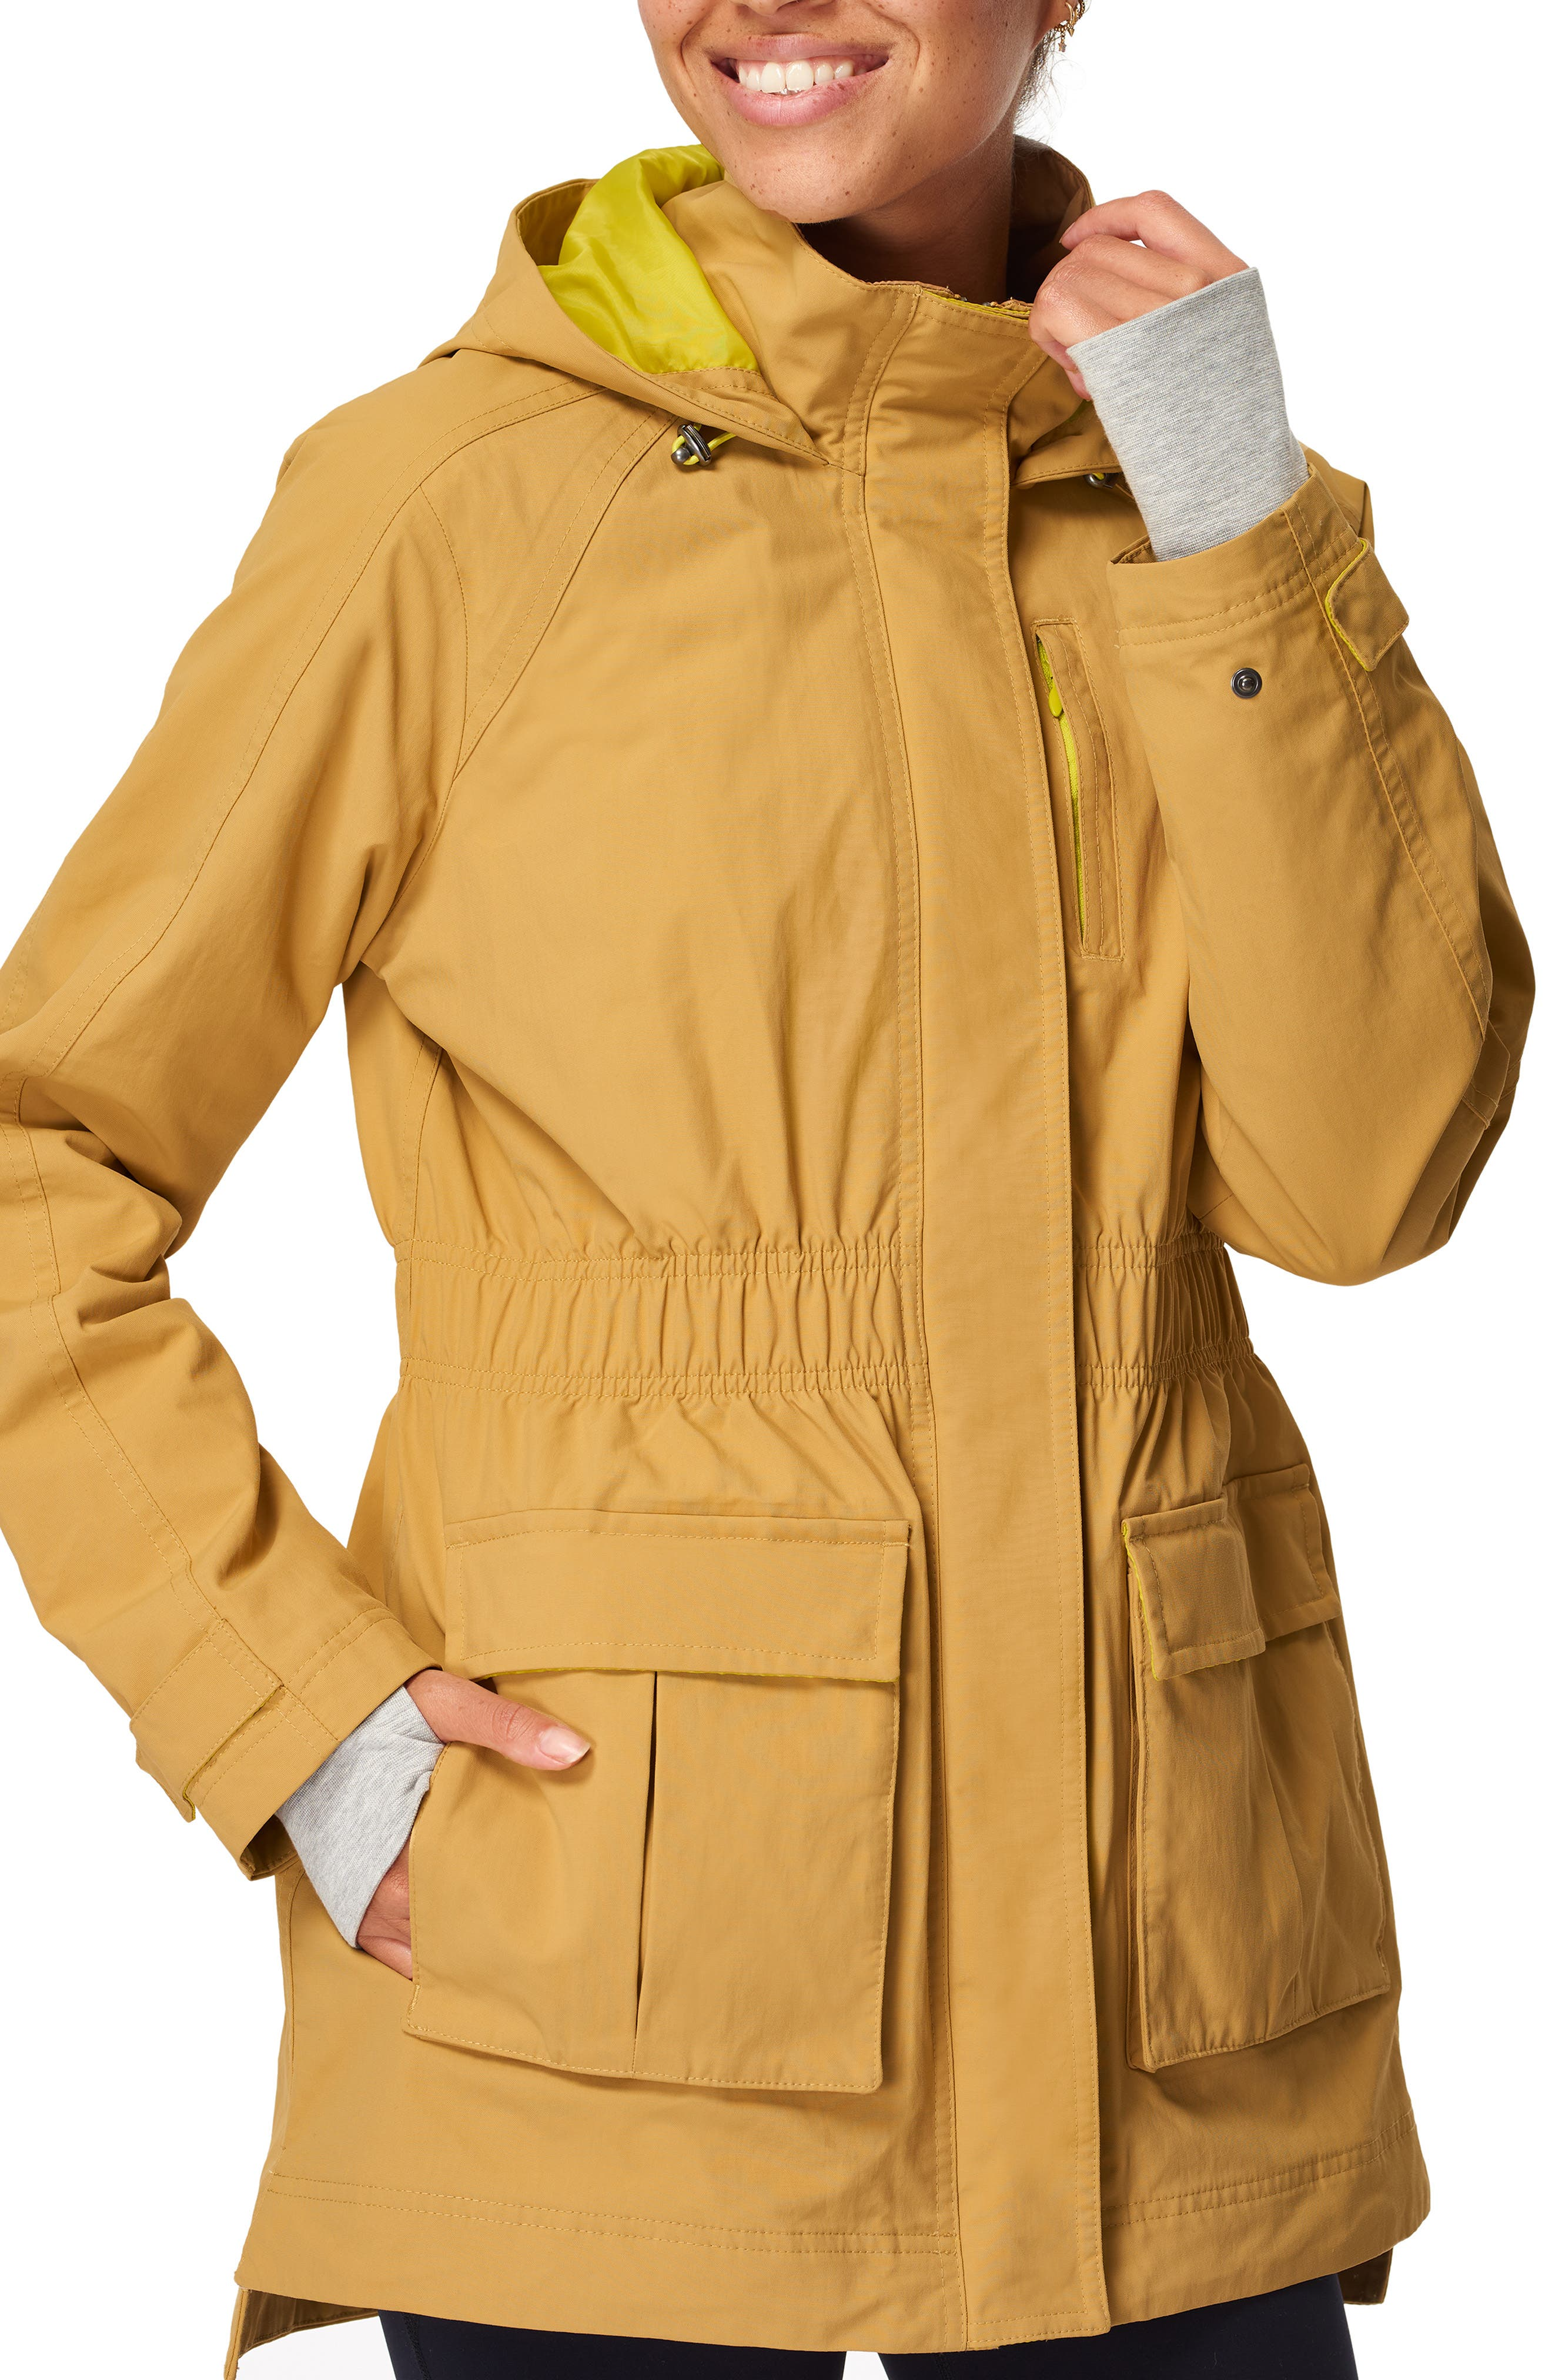 Sweaty Betty Snowdonia Waterproof Hiking Jacket   Nordstrom